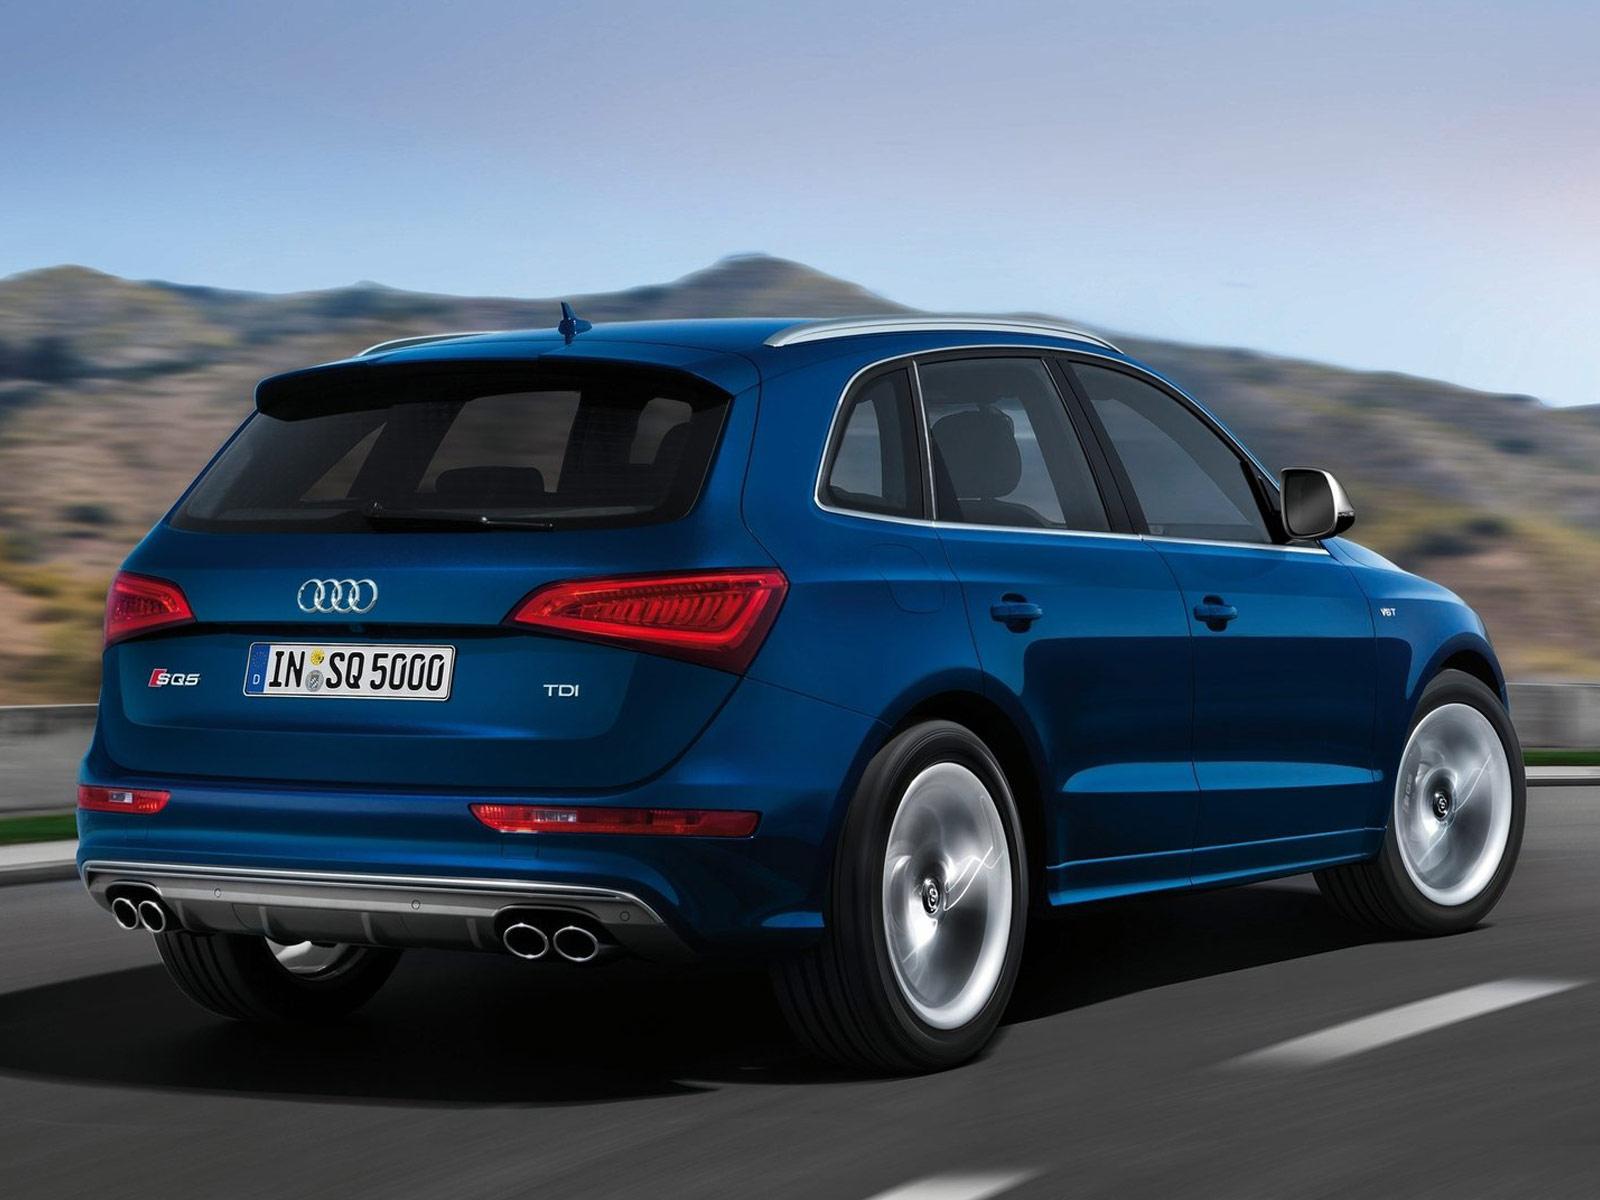 2013 Audi SQ5 TDI | Auto Insurance Information